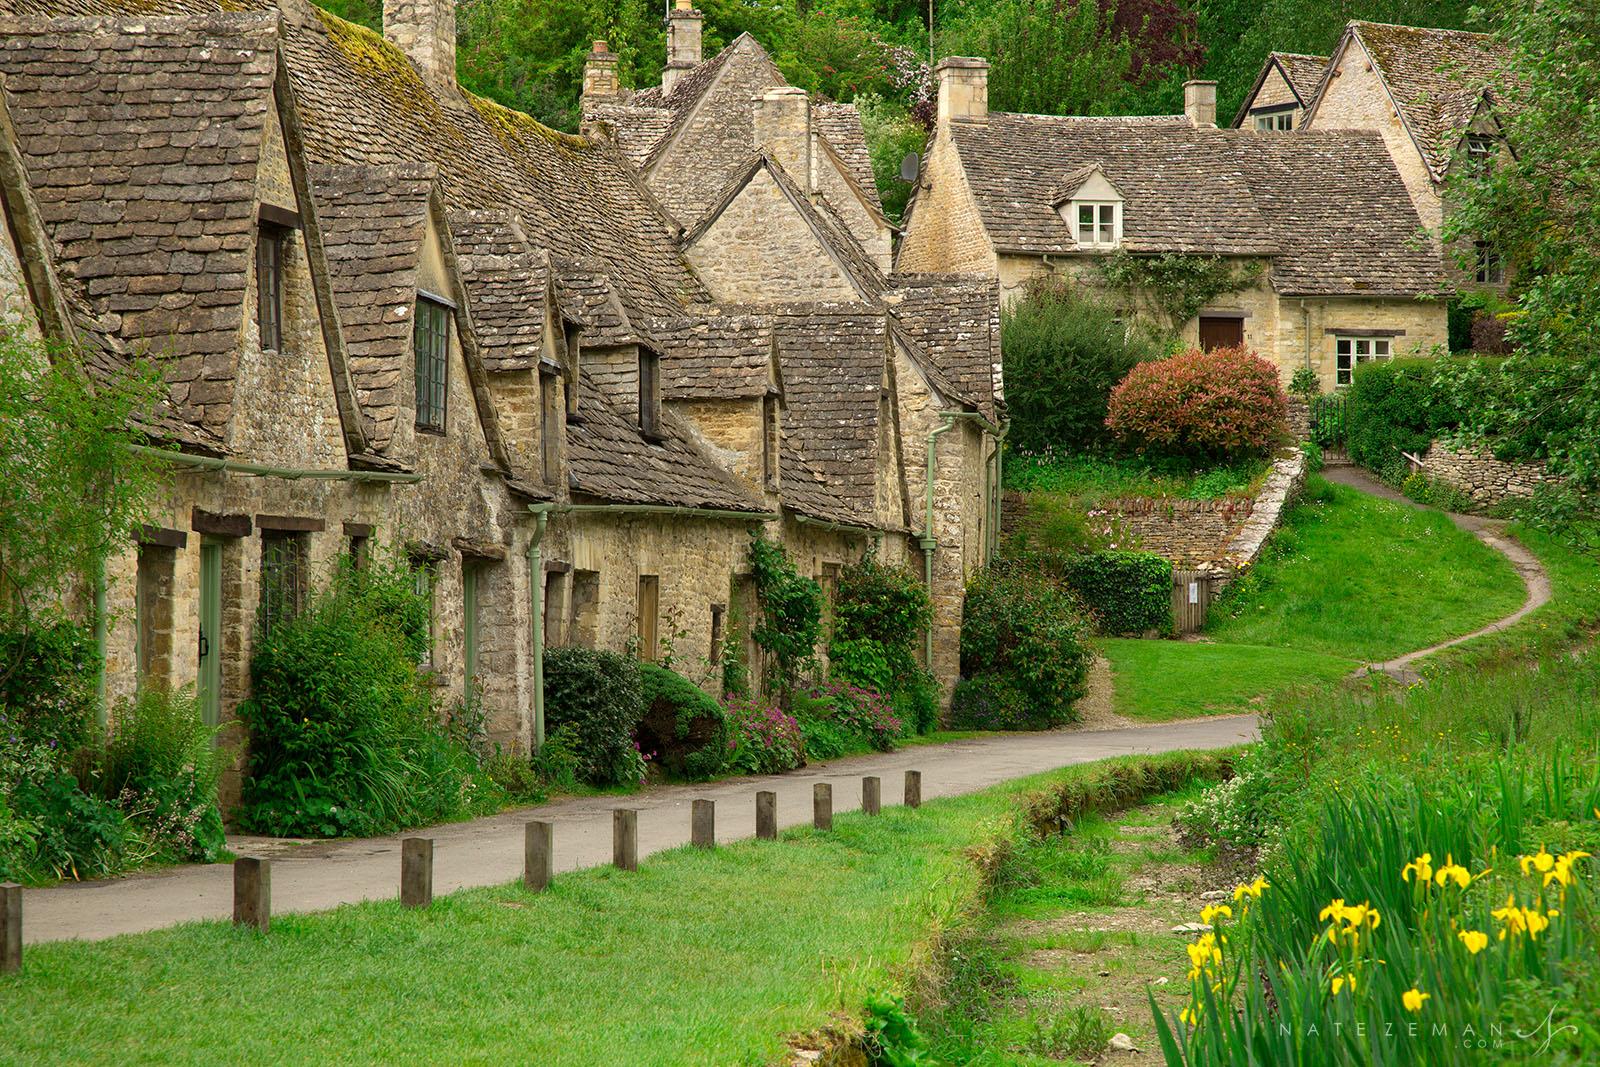 arlington row, cotswolds, england, cottages, bibury, photo